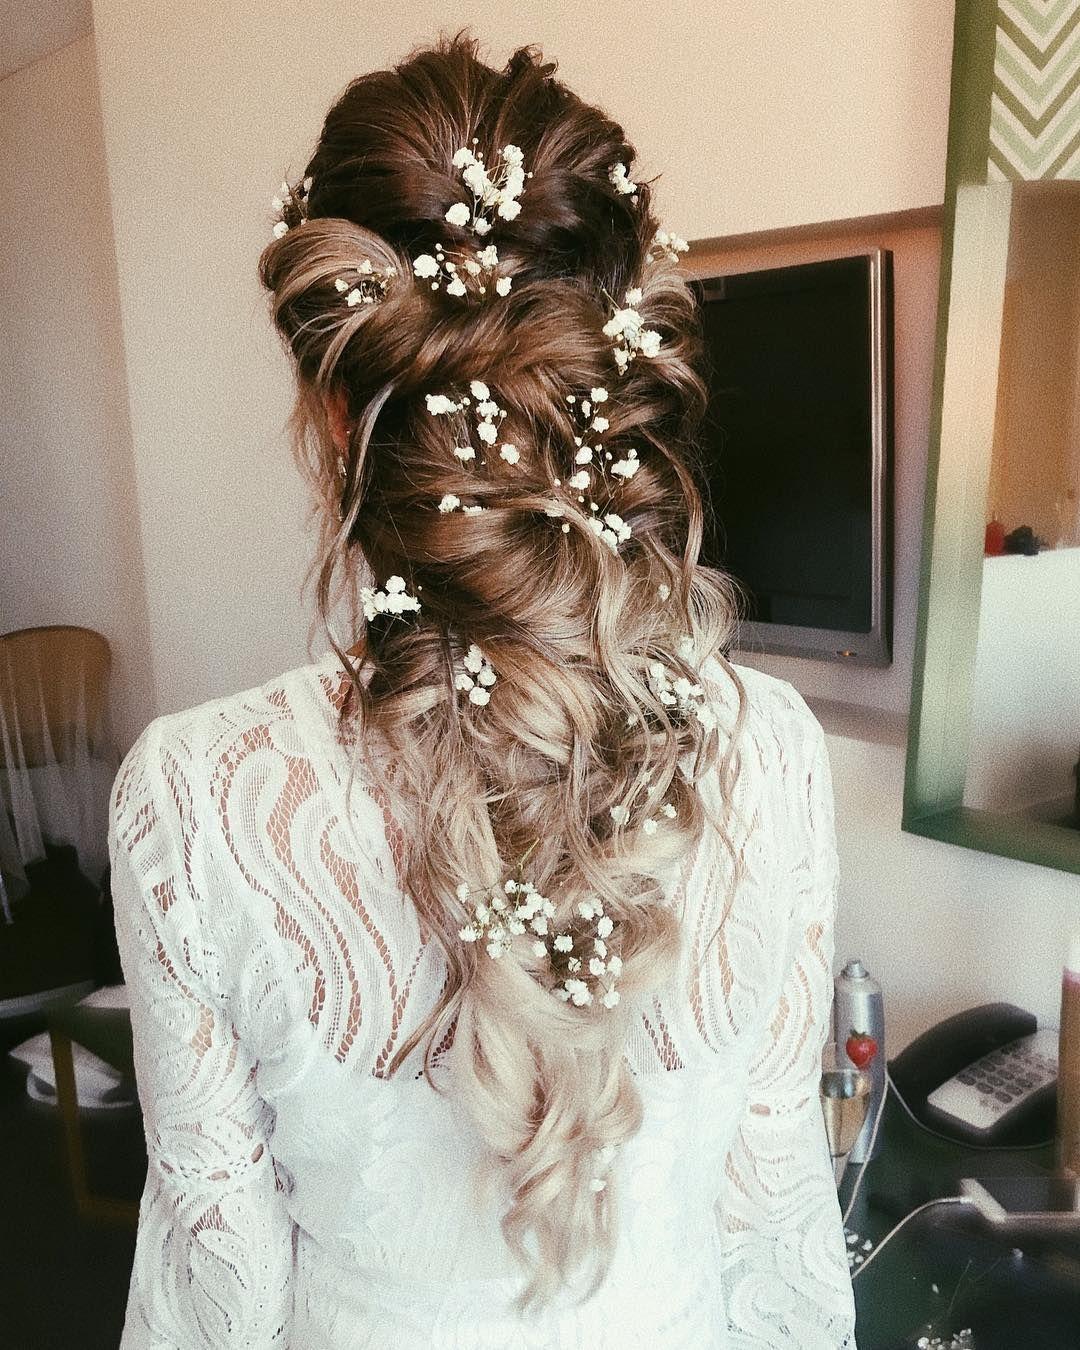 85 elegant wedding hairstyles - best wedding hairstyles for